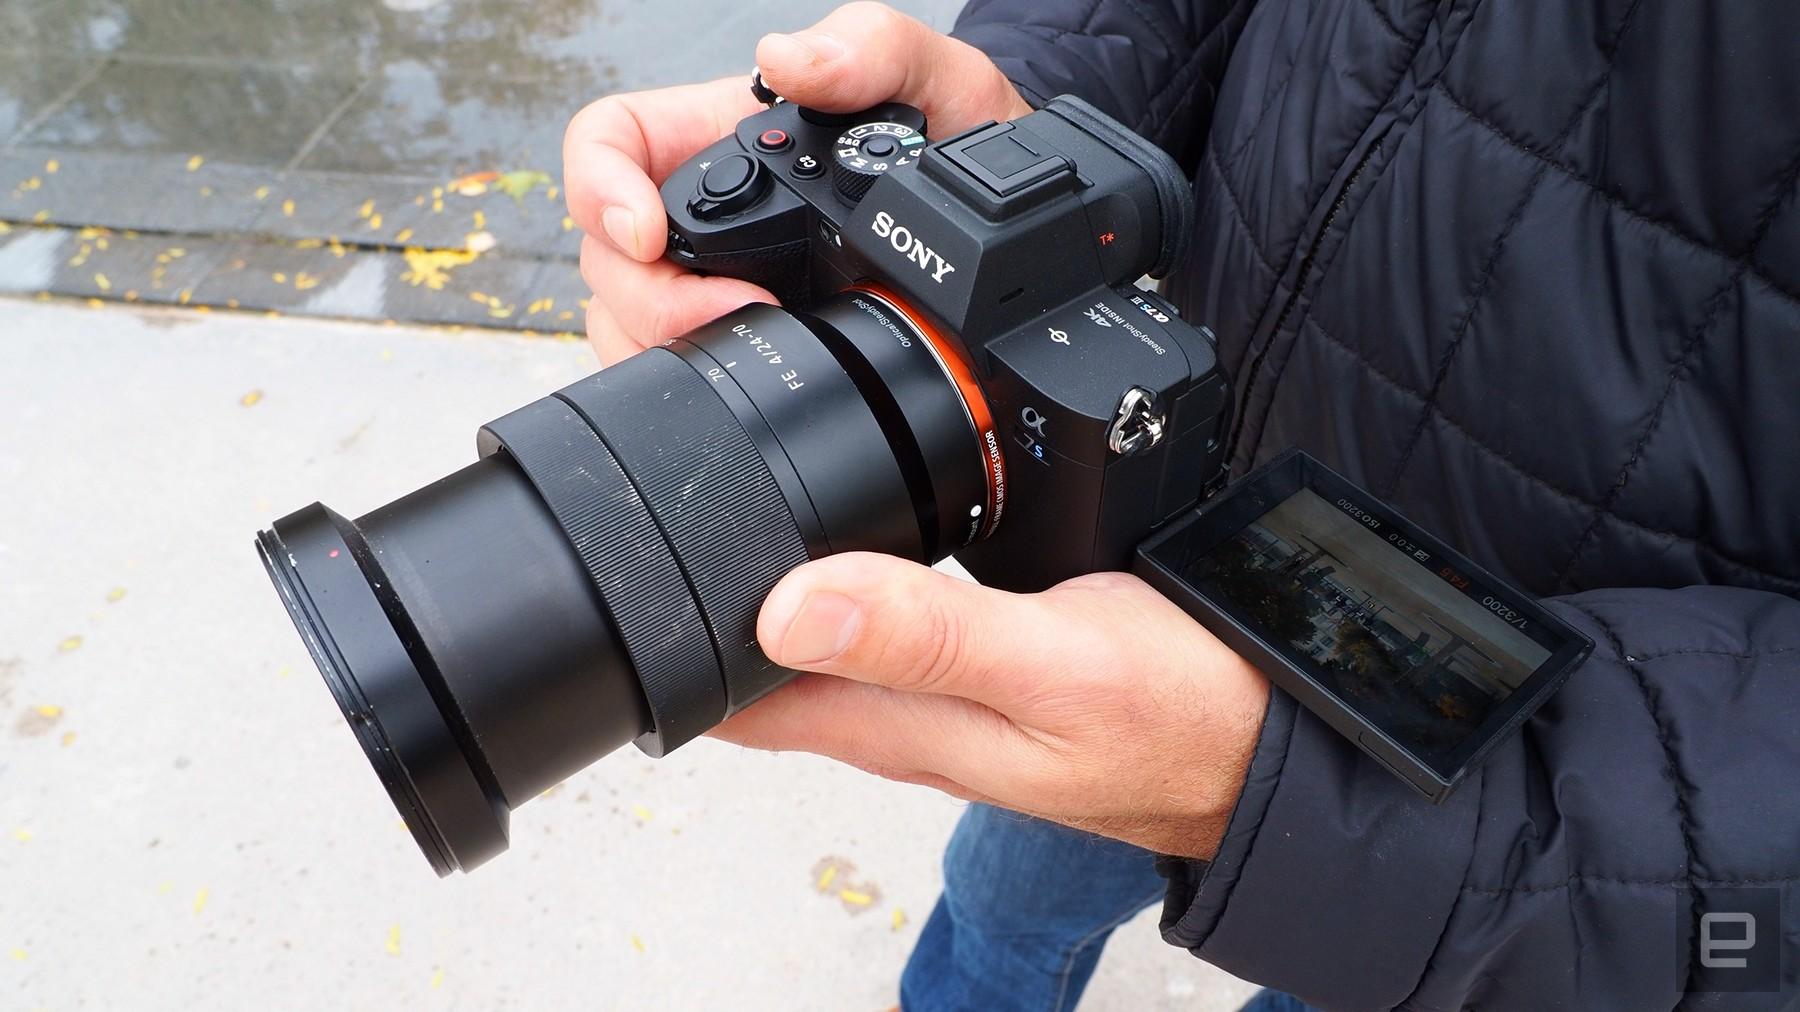 Sony 12.1-megapixel full-frame mirrorless camera